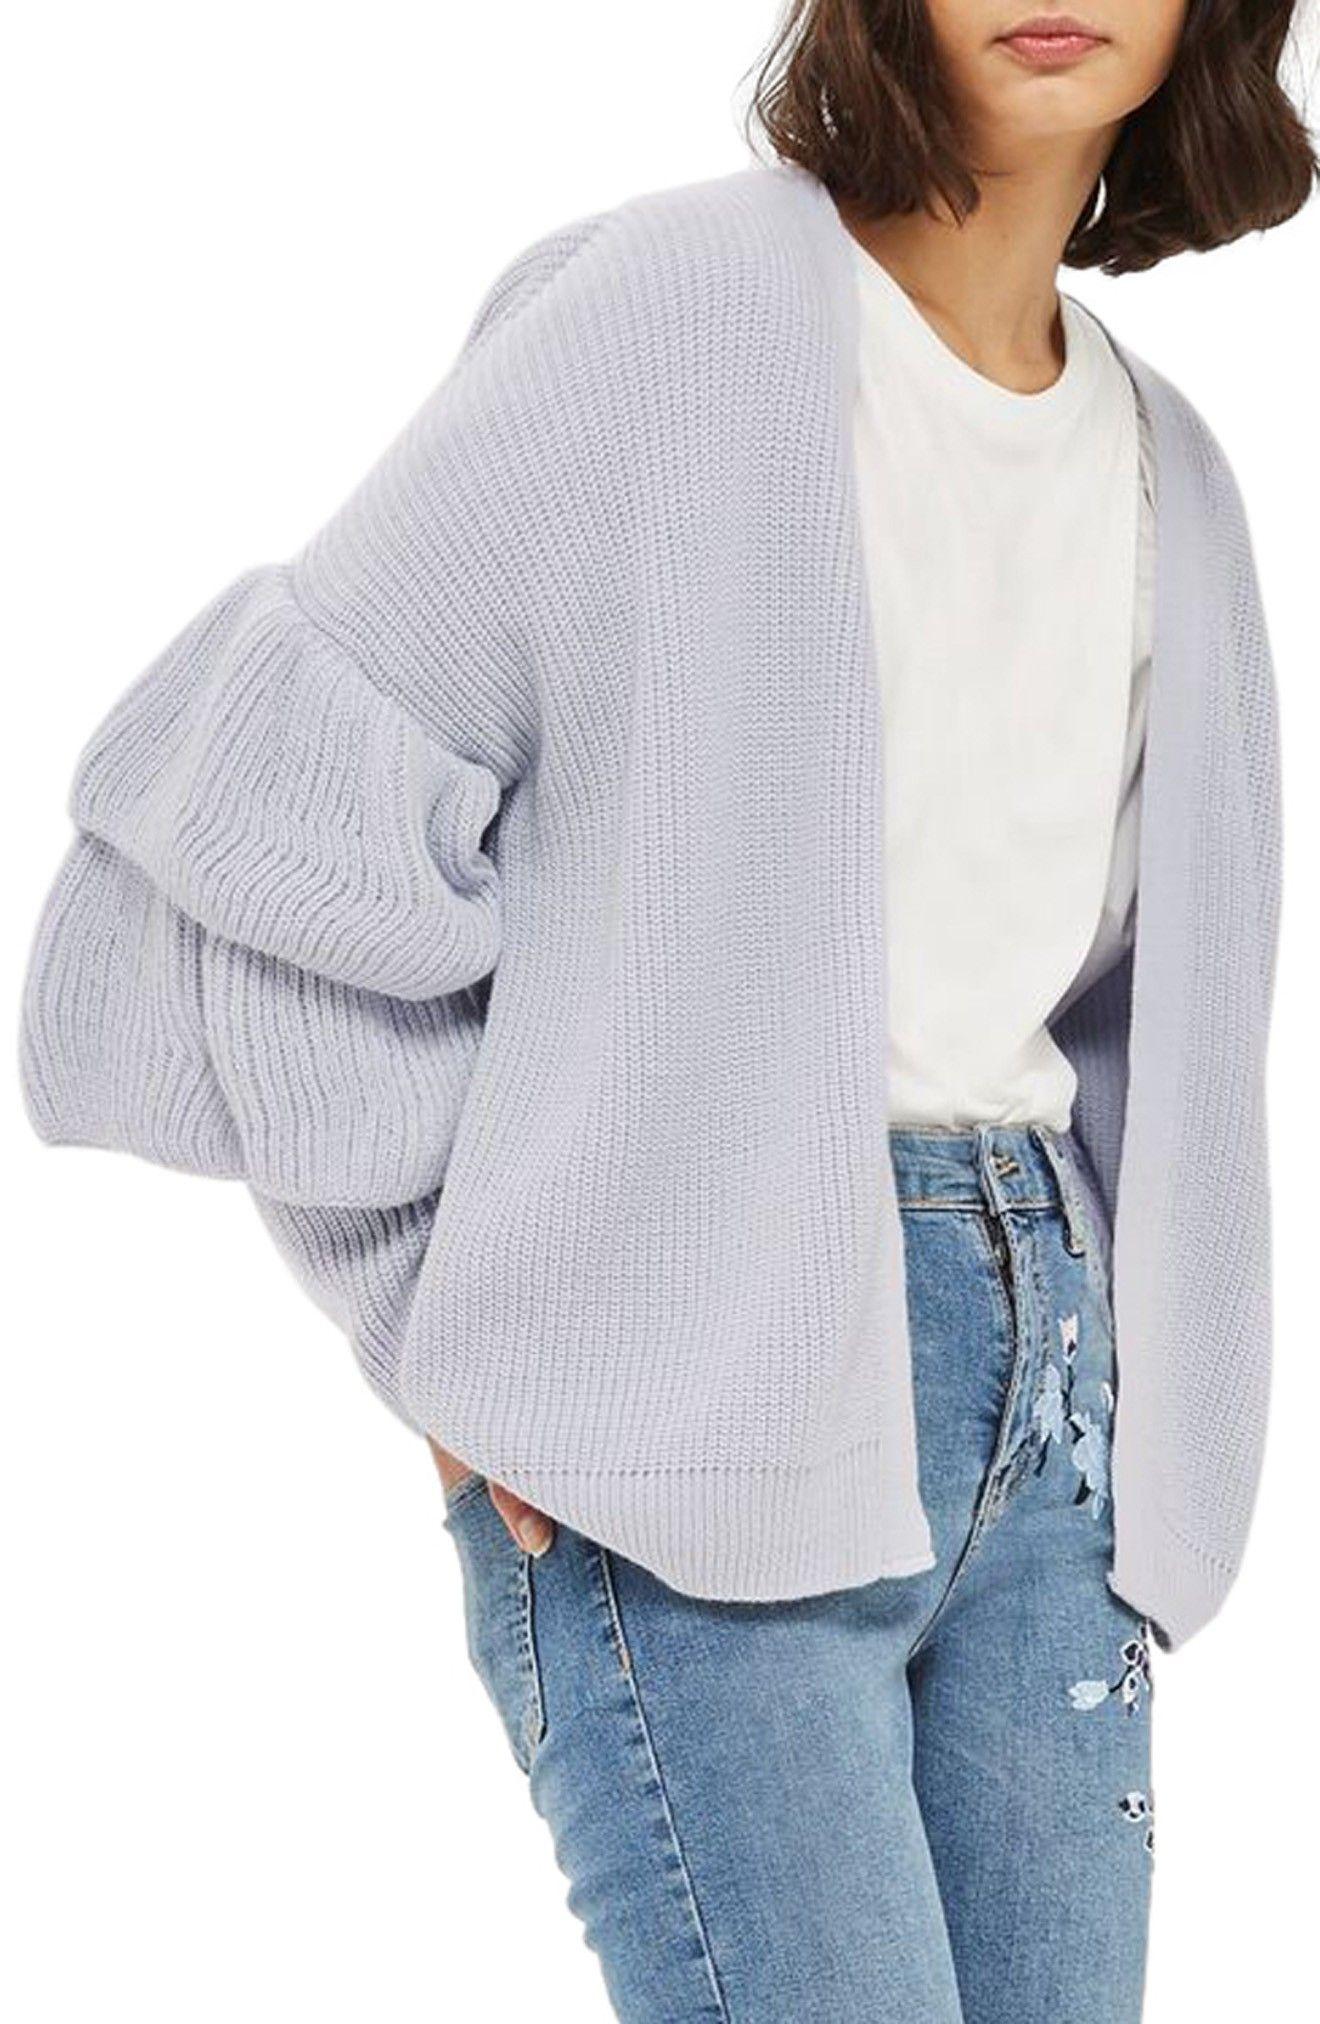 Layered Ruffle Sleeve Cardigan #wishlist #fall #sweater | Things ...